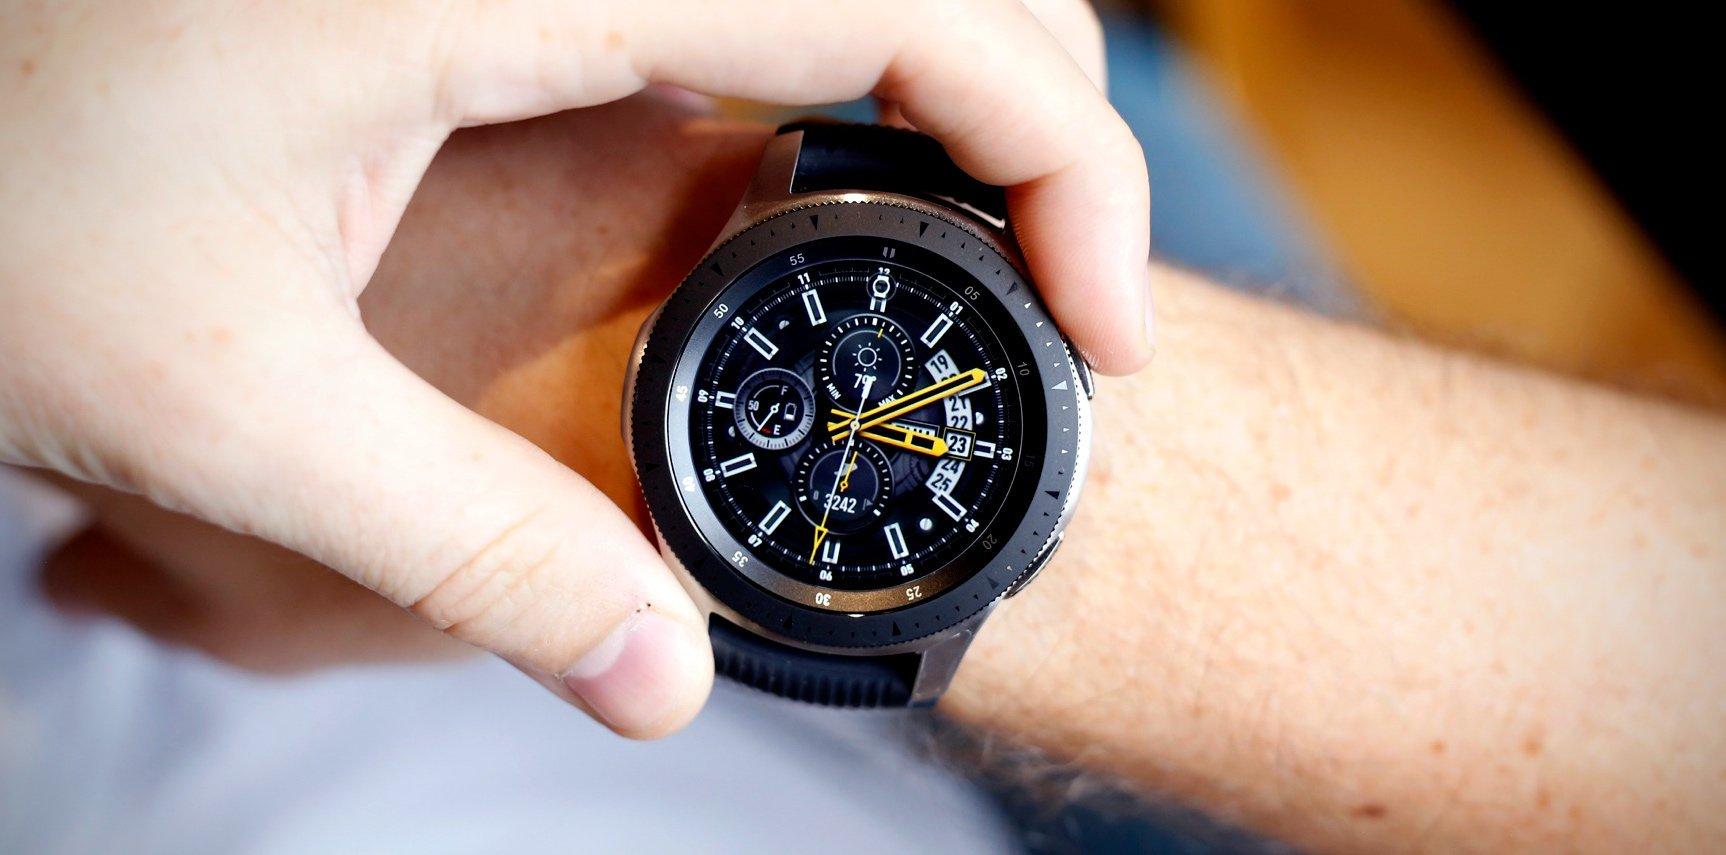 Best Smartwatch for Samsung Galaxy Note 10 & Note 10+